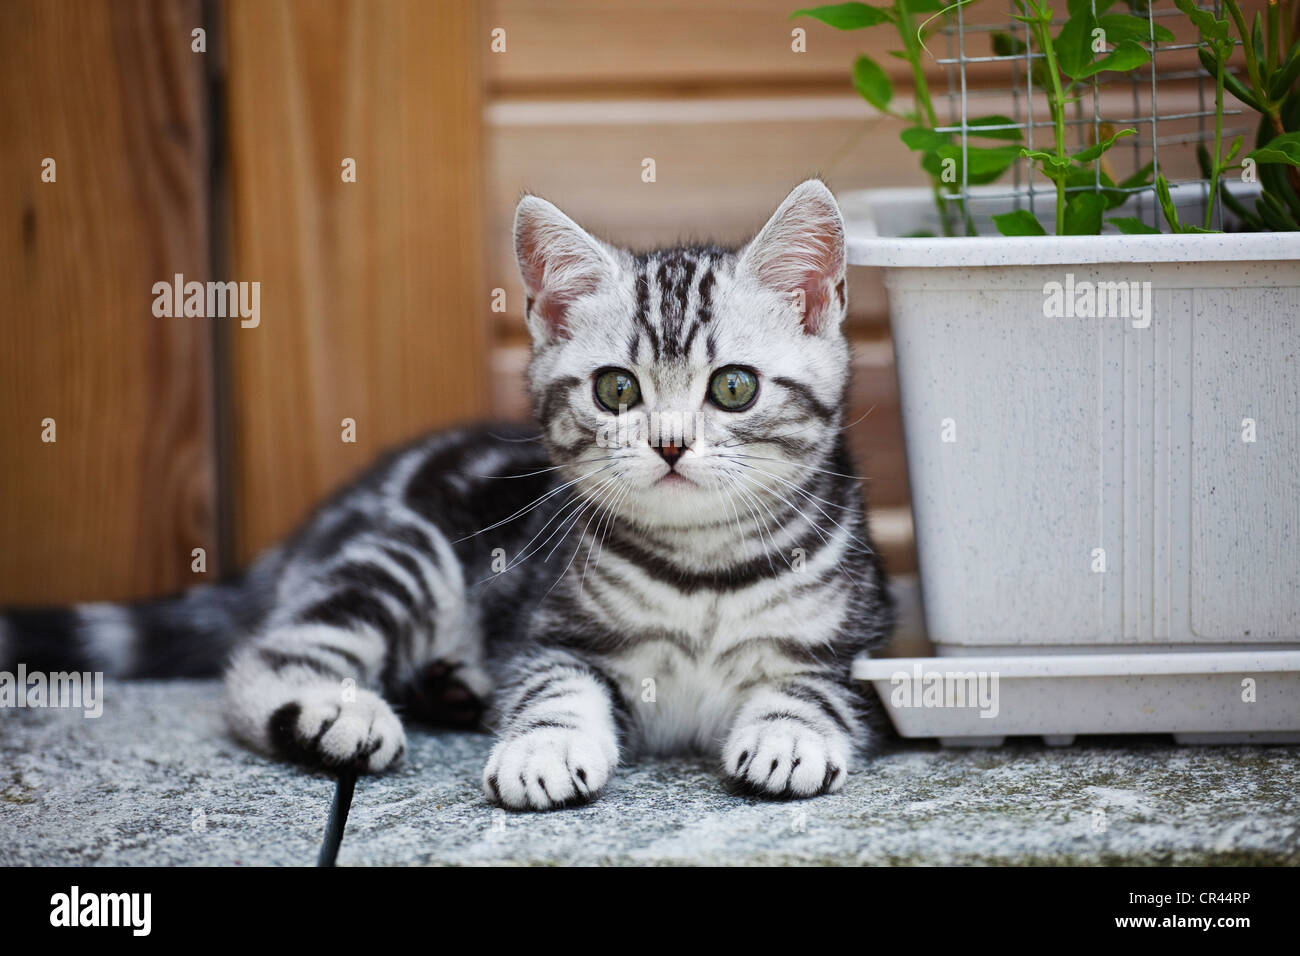 Little silver tabby British Shorthair kitten in the garden Stock